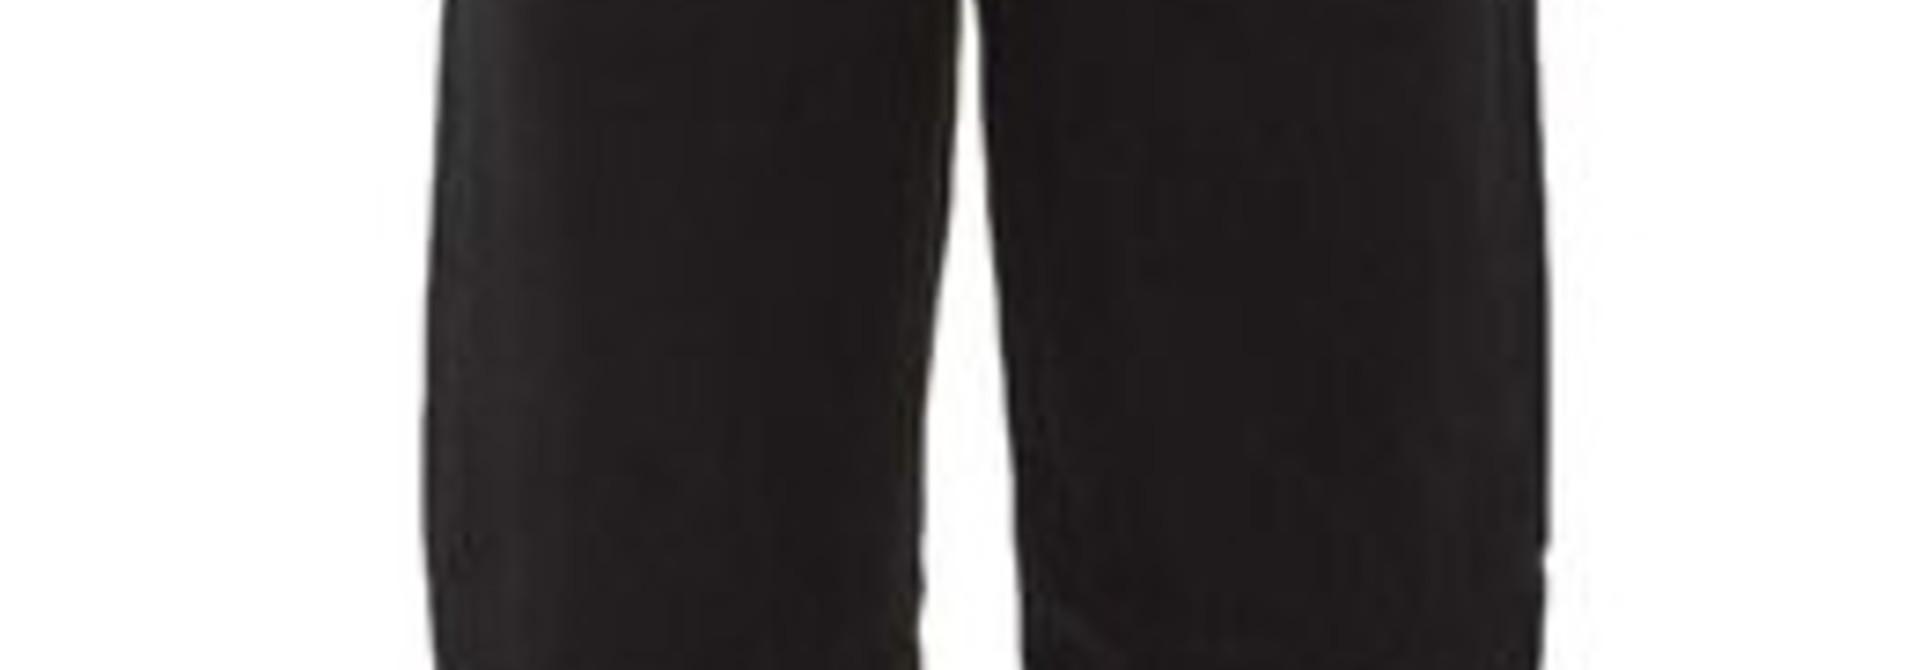 LEVI'S BALLOON LEG 85314-0000 BLACK BOOK BALLOON